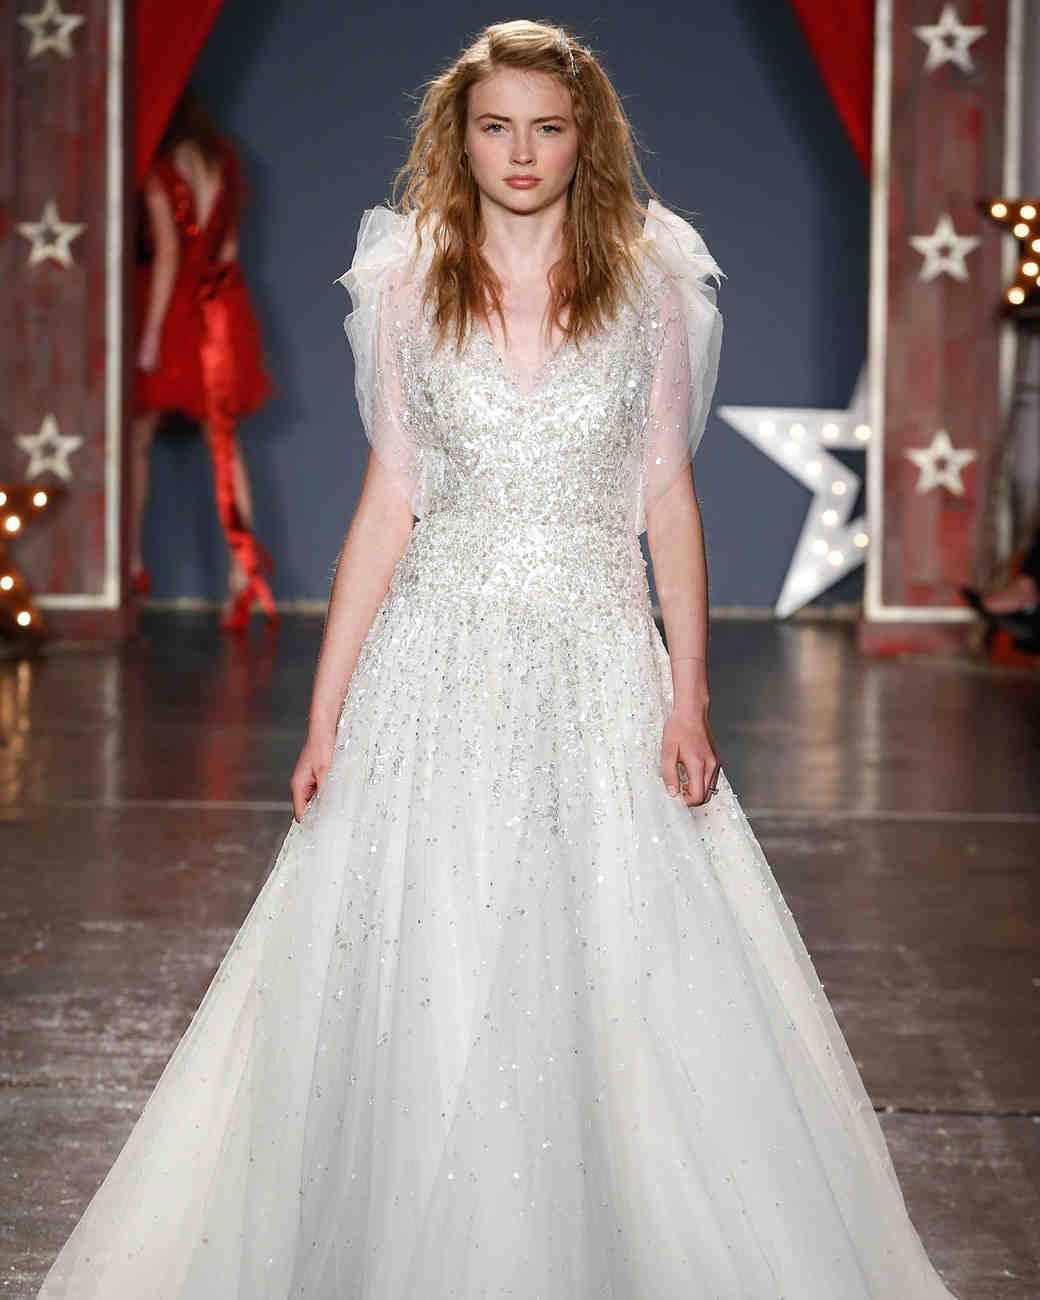 jenny packham wedding dress spring 2018 sequin ballgown tulle sleeves